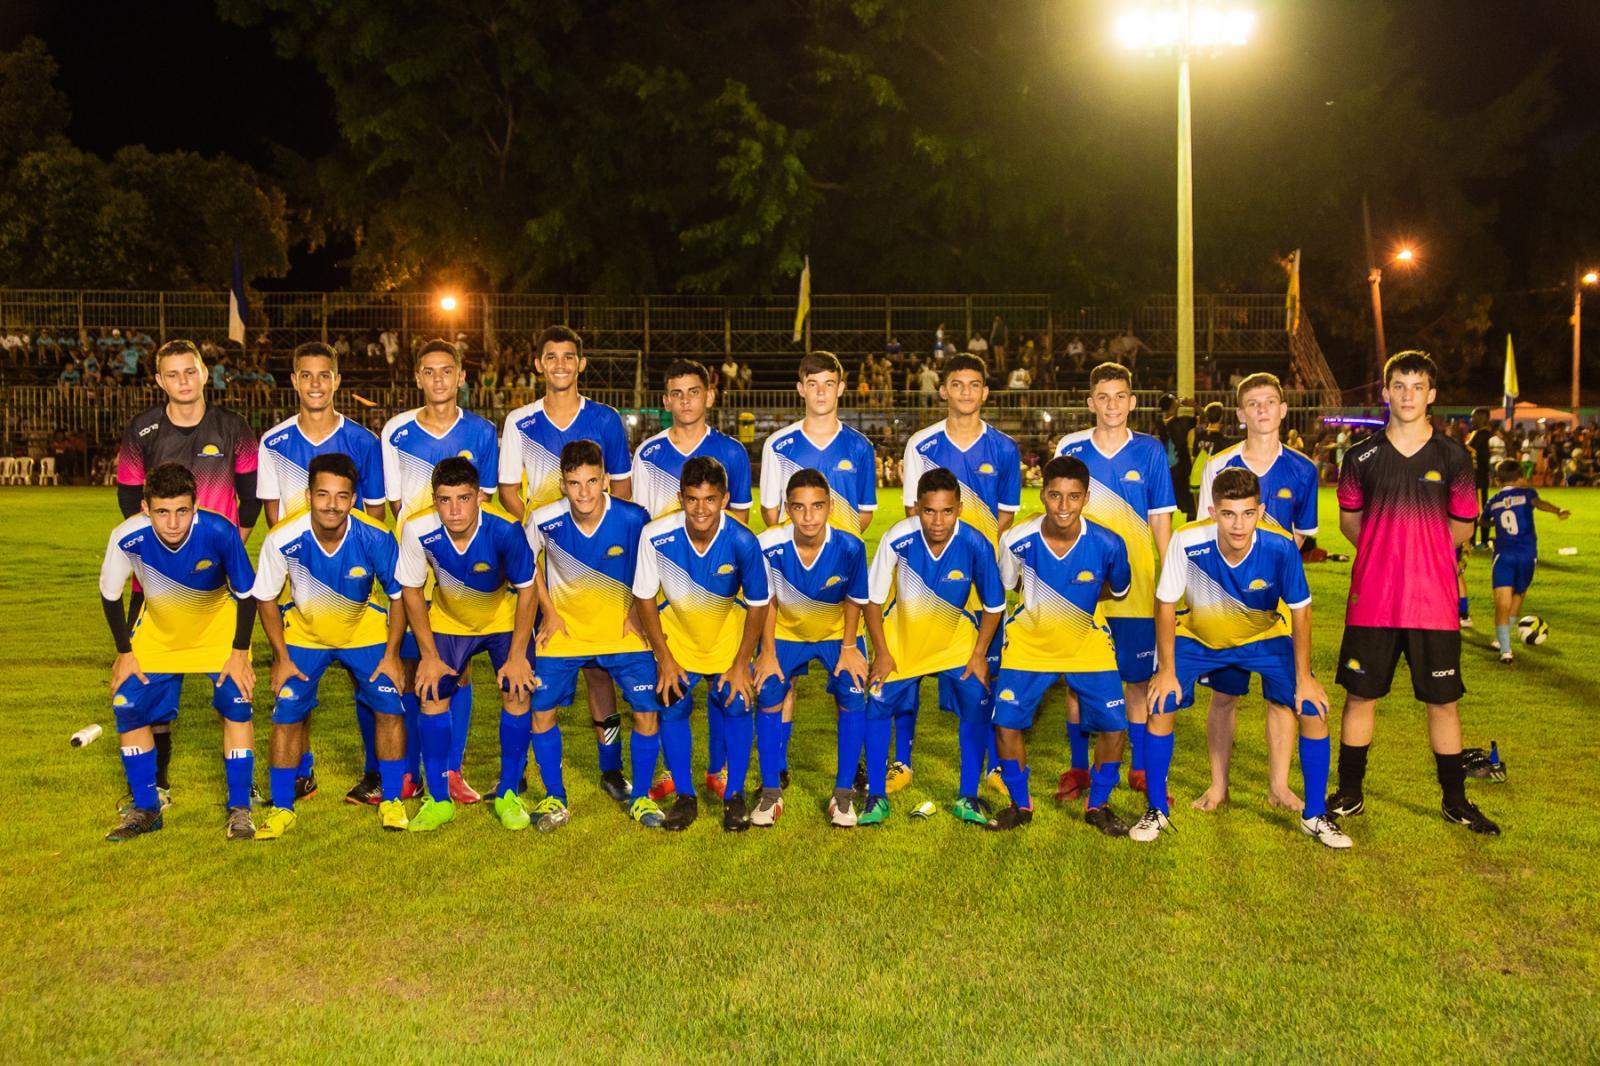 Copa A Gazetinha: Itarana na disputa do